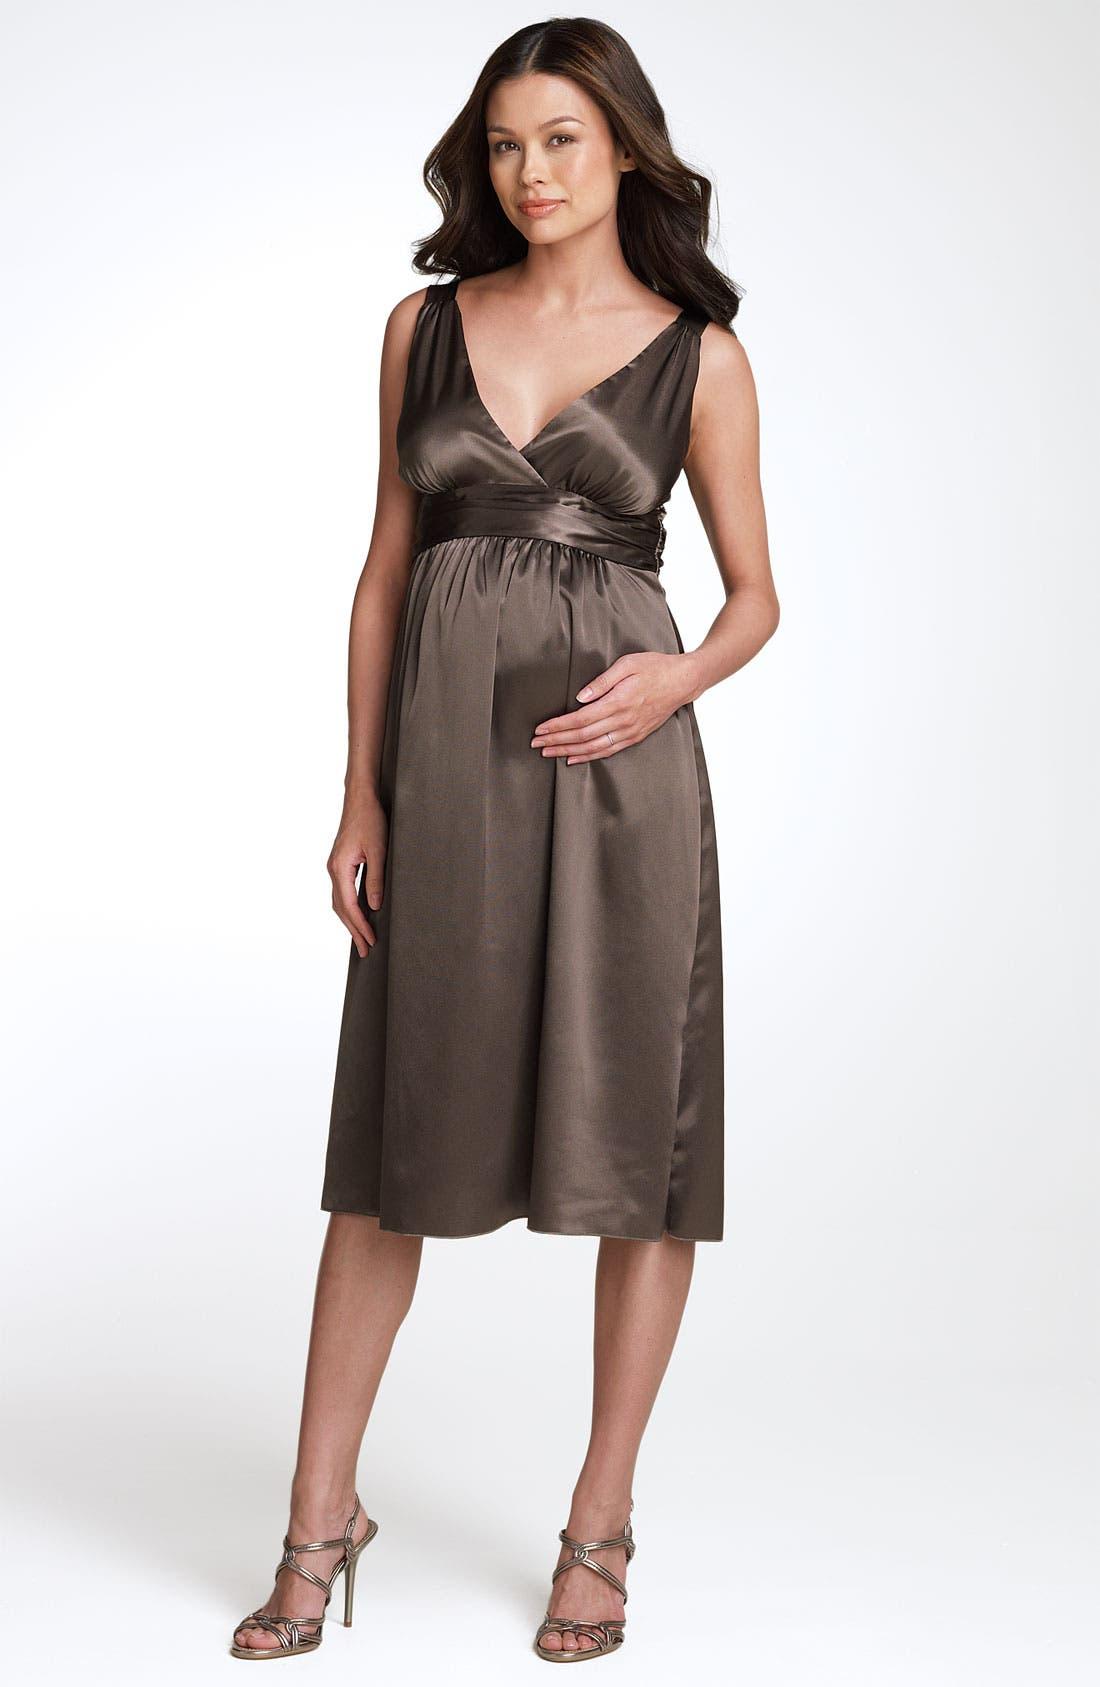 Alternate Image 1 Selected - Ripe Maternity 'Deluxe' Satin Dress